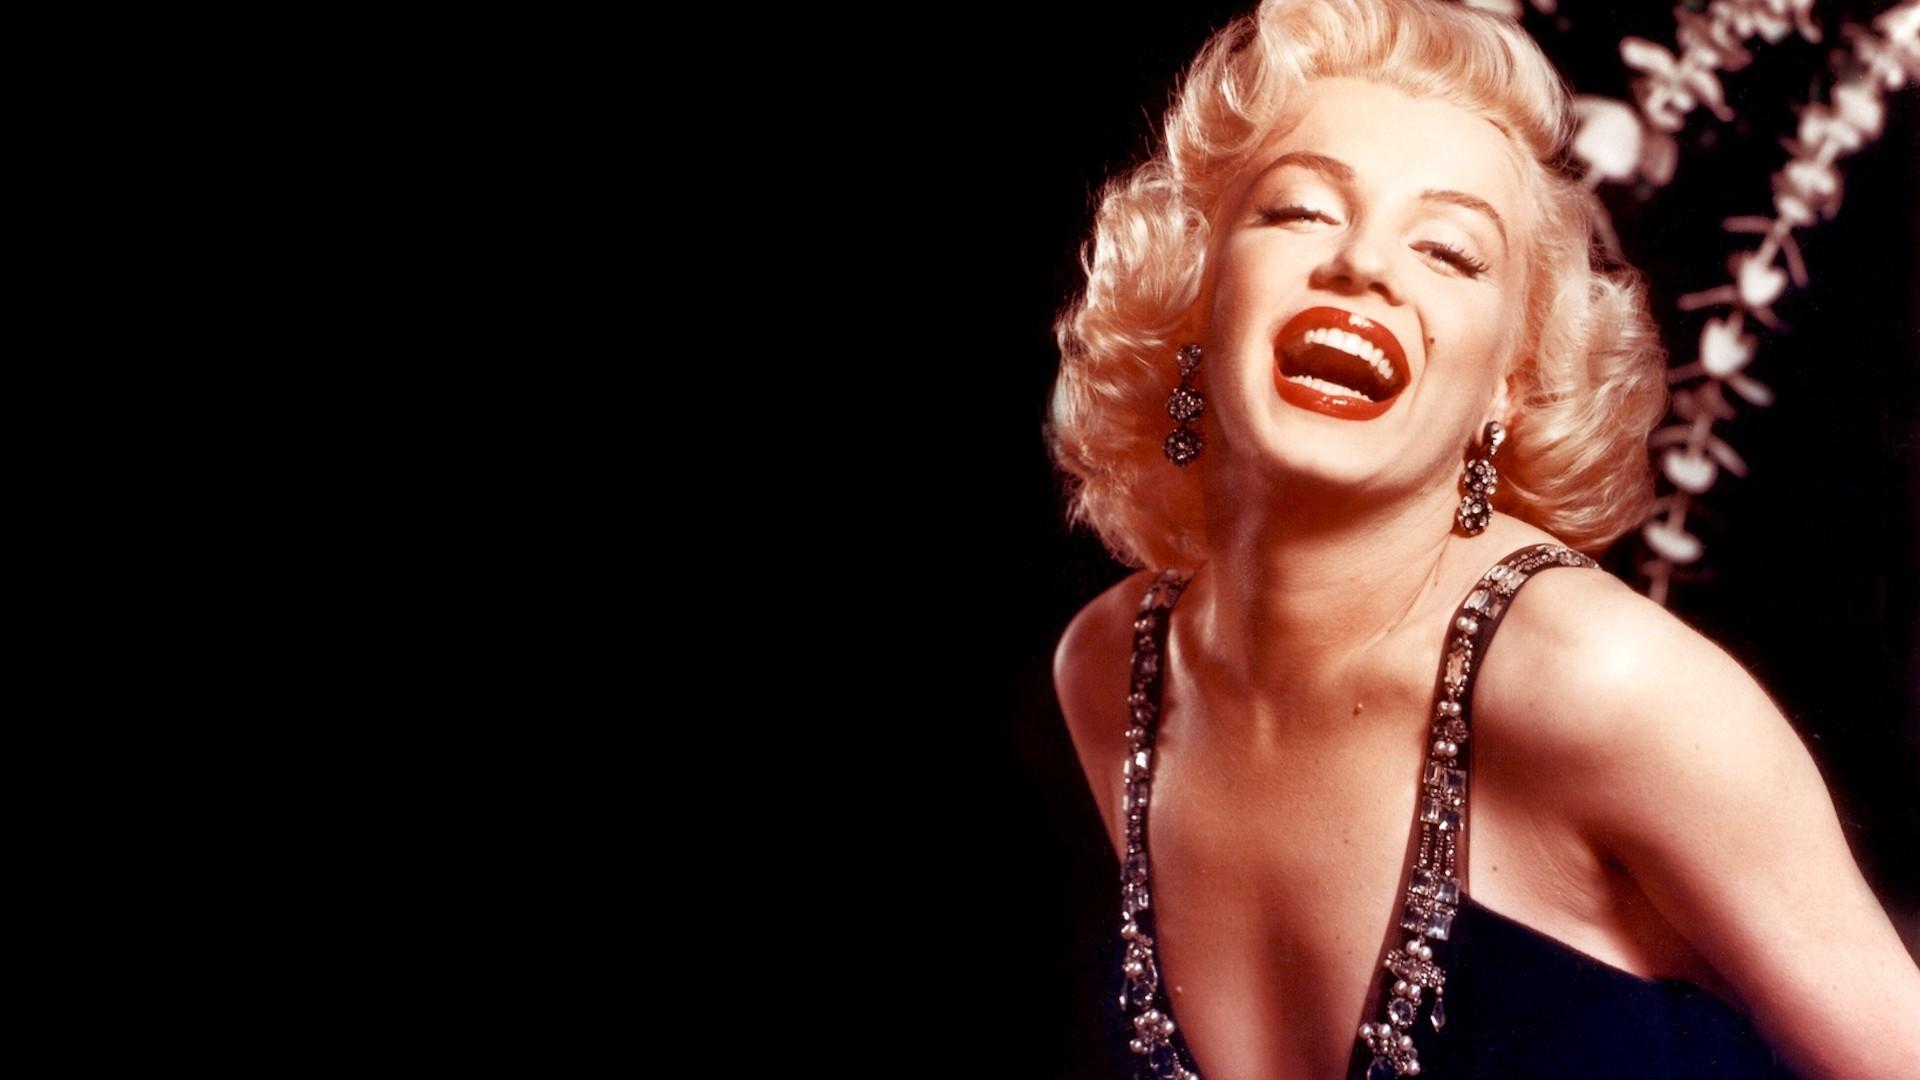 Cute Marilyn Monroe HD PicturesPhotos ImagesHigh Quality 1920x1080